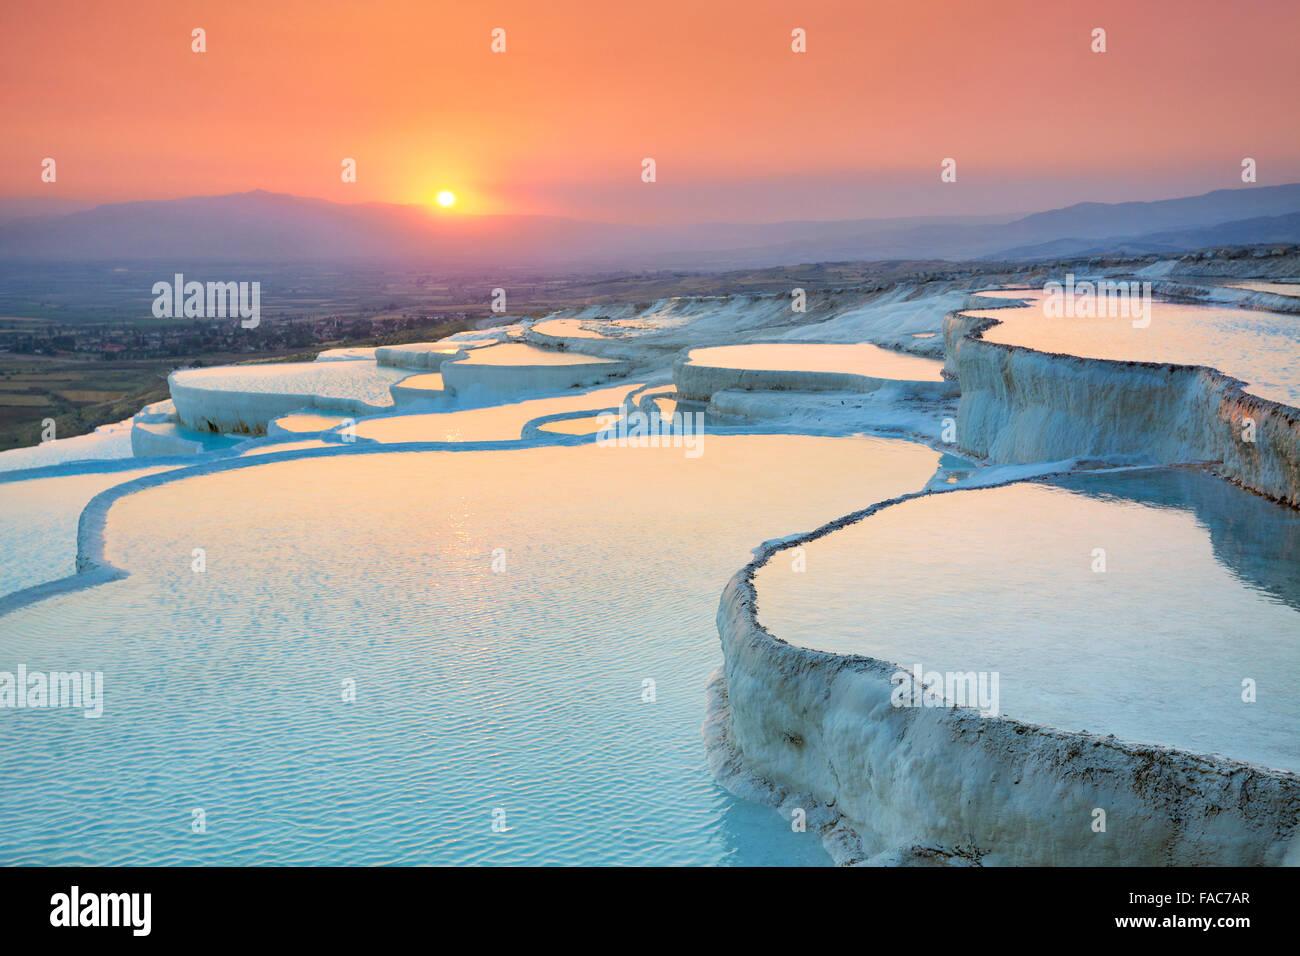 Paisajes en Pamukkale sunset - Terrazas de carbonatos minerales dejados por el agua que fluye, Pamukkale, Turquía Imagen De Stock